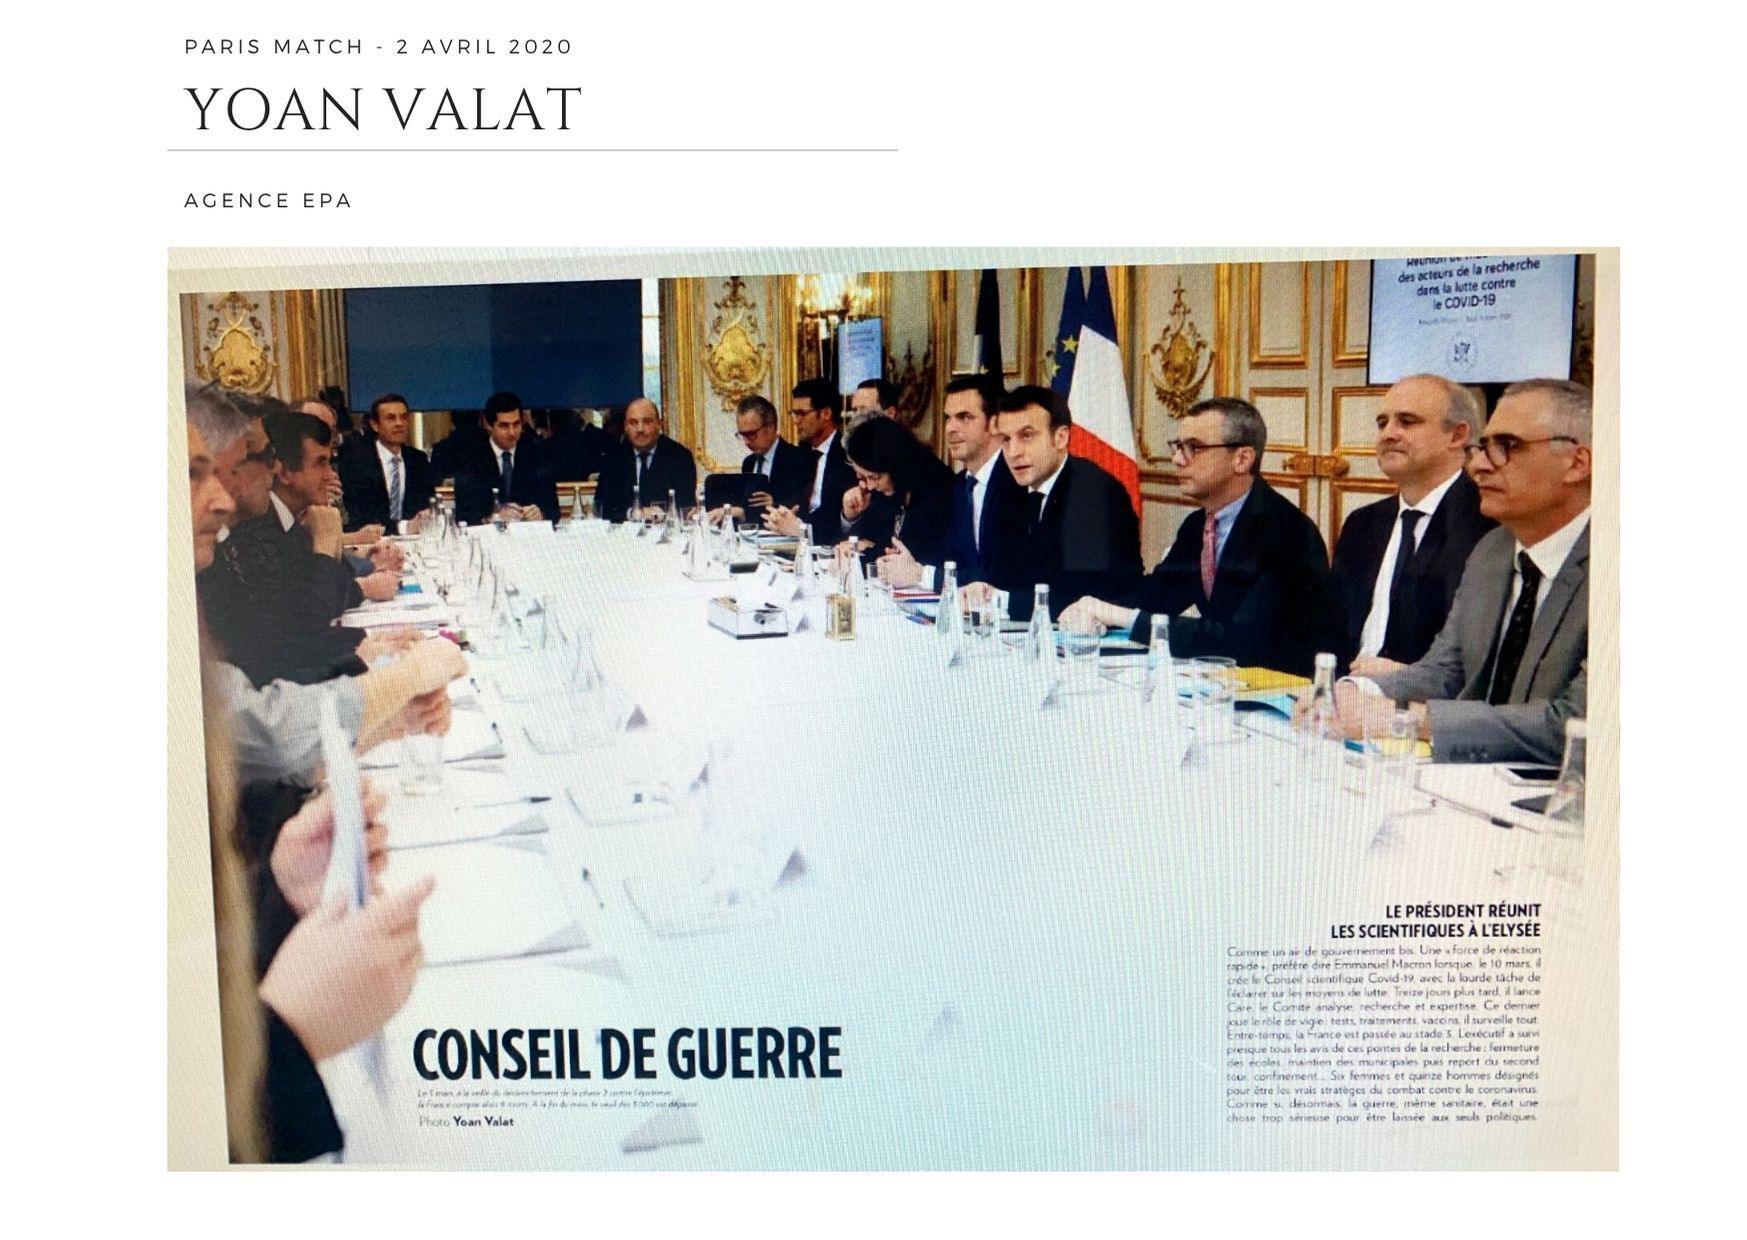 Paris Match - 2 avril 2020